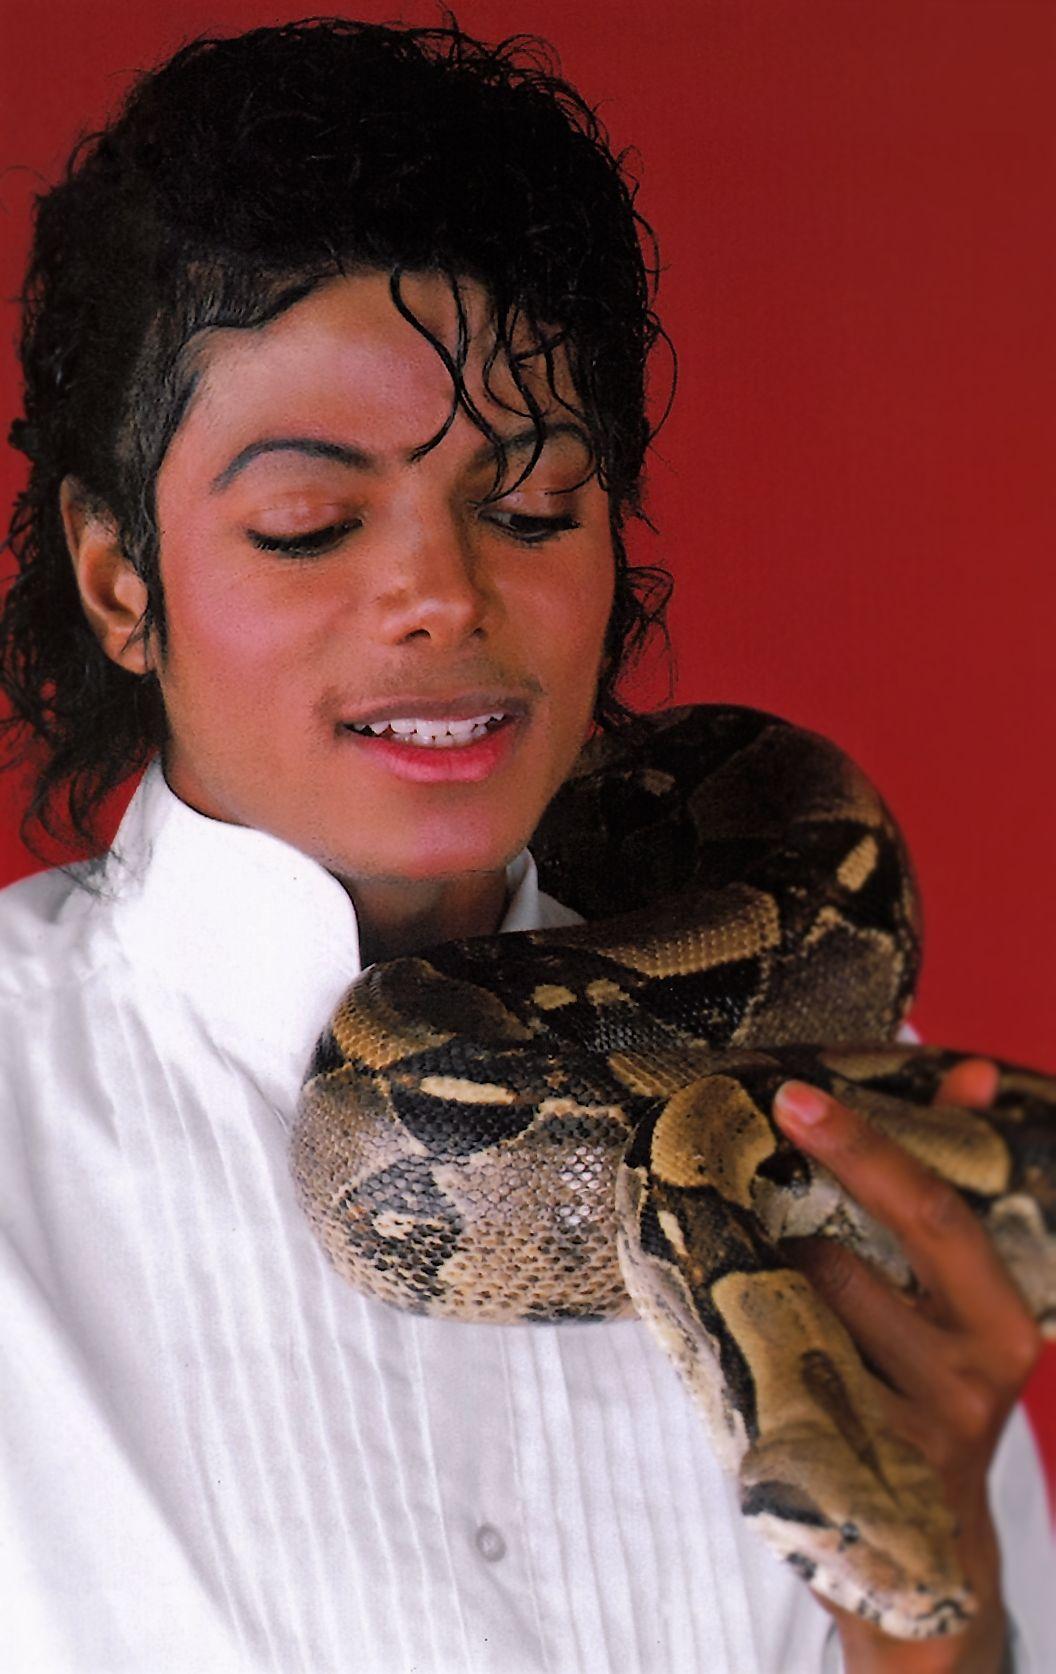 Michael Jackson & Muscles